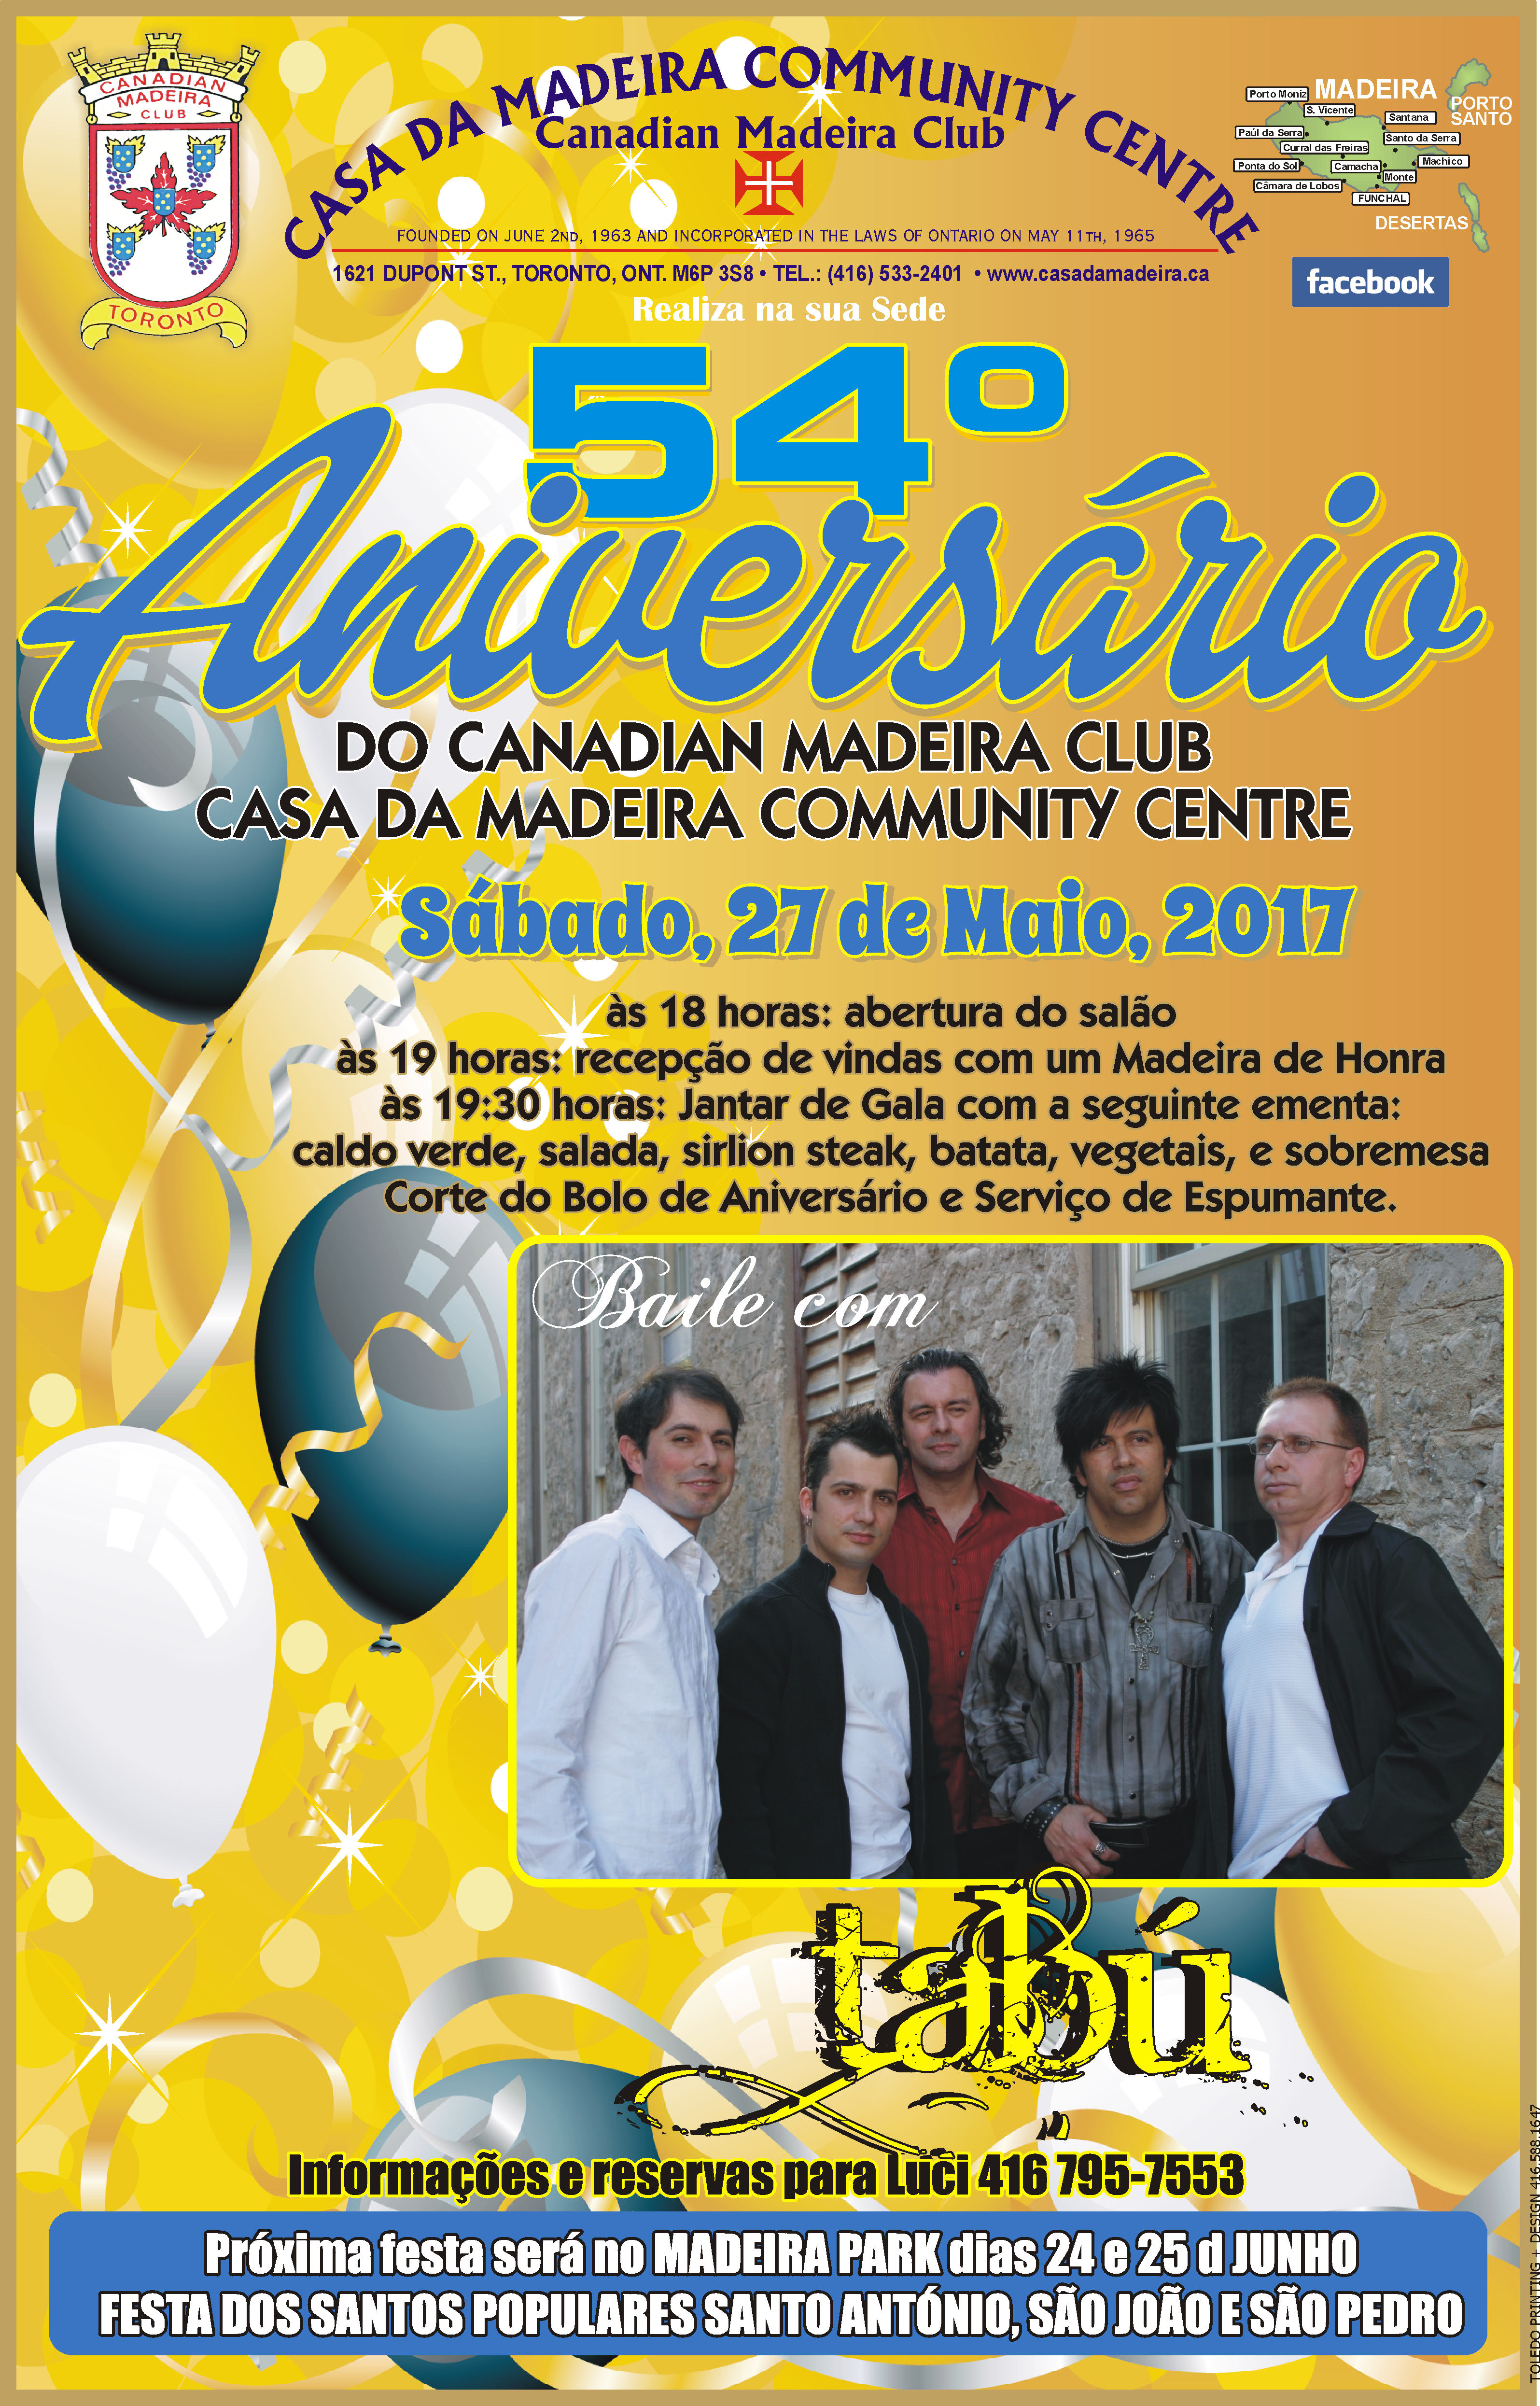 Casa da Madeira Anniversary poster